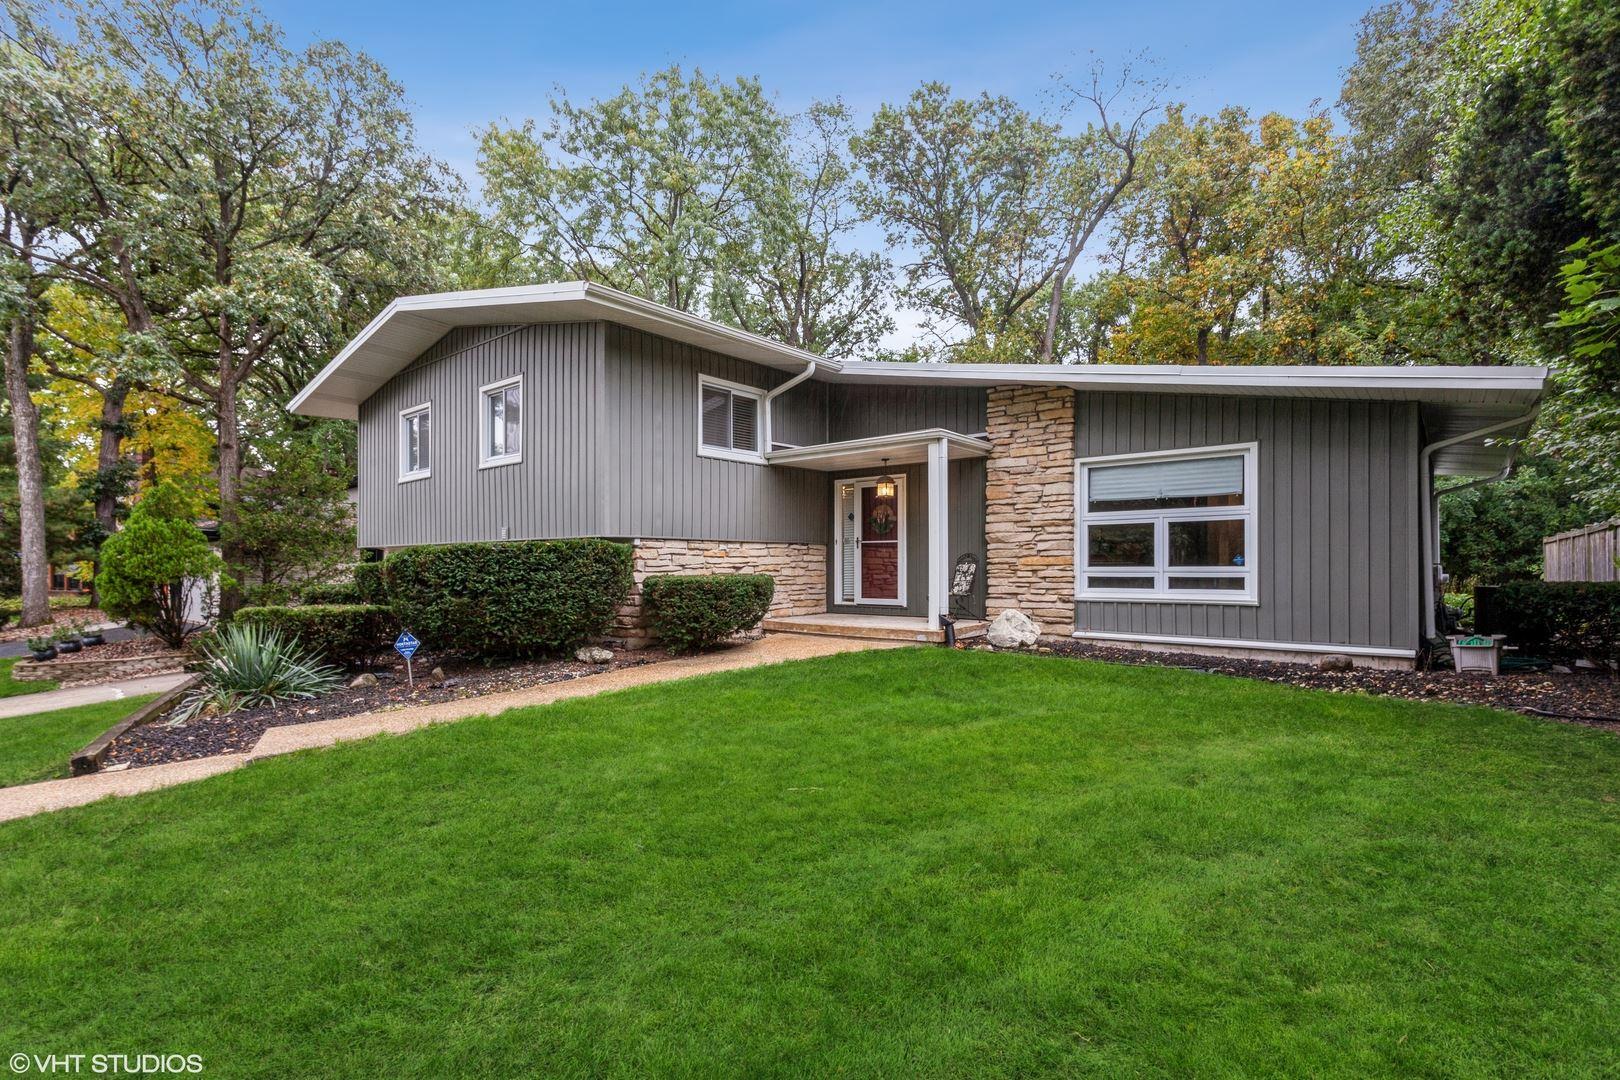 1161 Barneswood Drive, Downers Grove, IL 60515 - #: 11244856